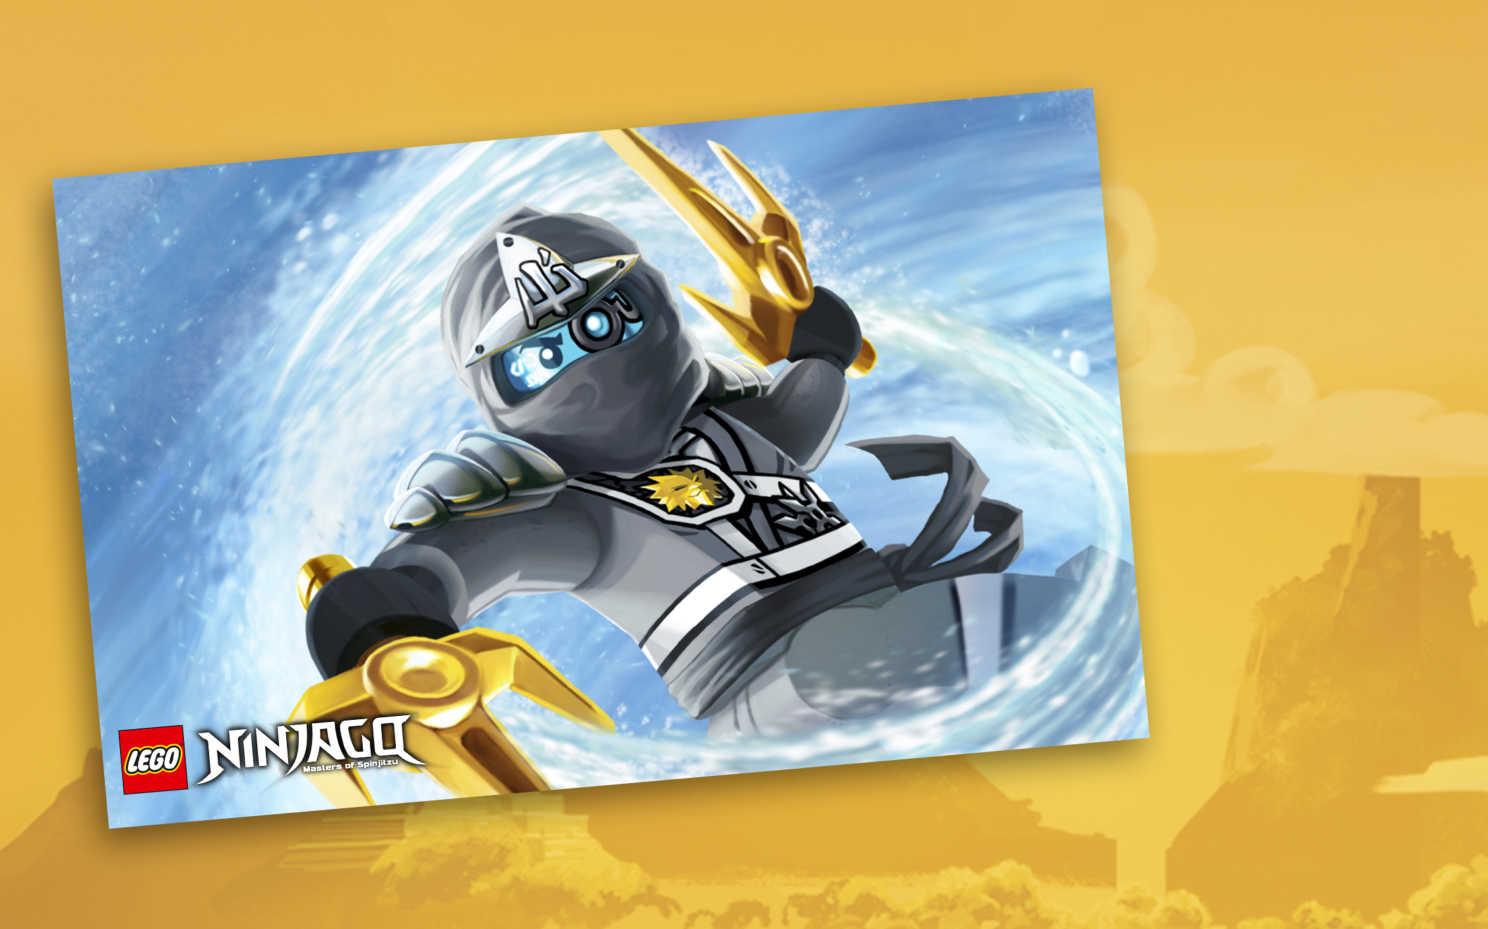 Zane   Wallpaper   Activities   Ninjago LEGOcom 1488x929